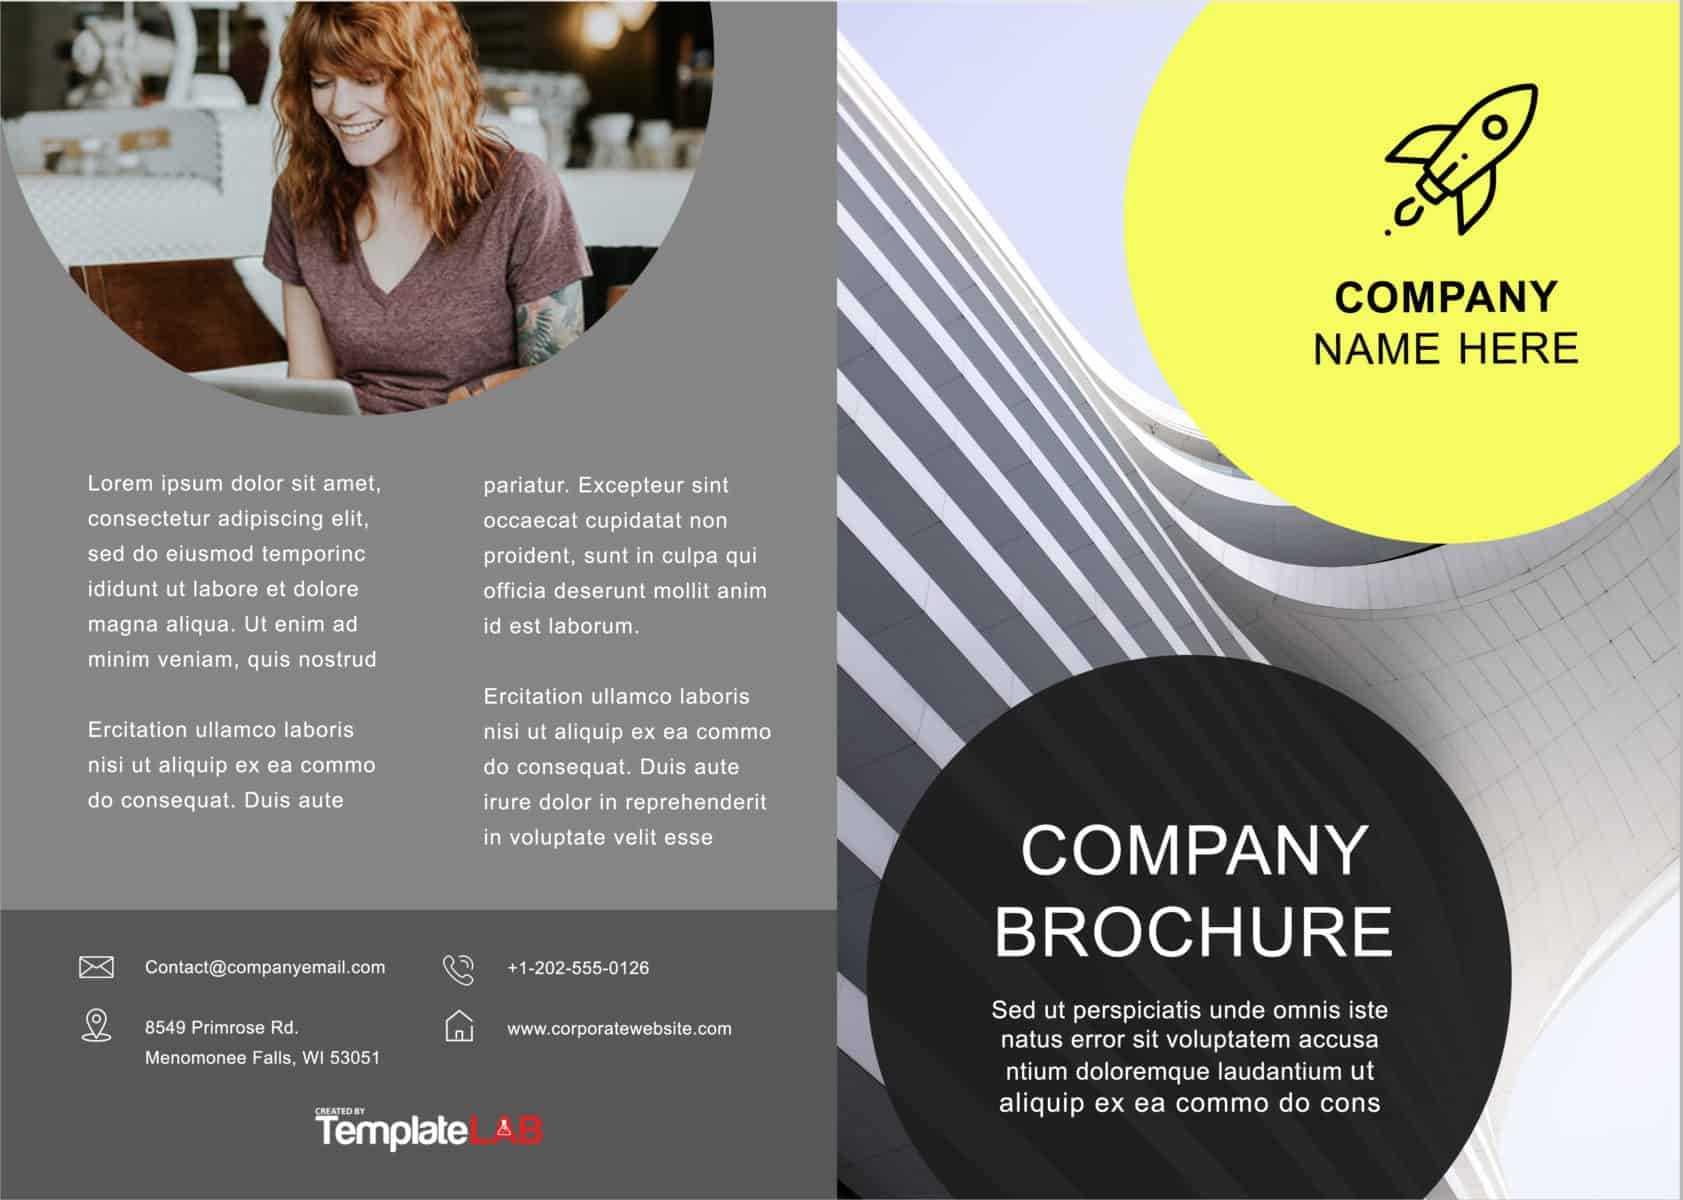 33 Free Brochure Templates (Word + Pdf) ᐅ Templatelab Within Microsoft Word Brochure Template Free